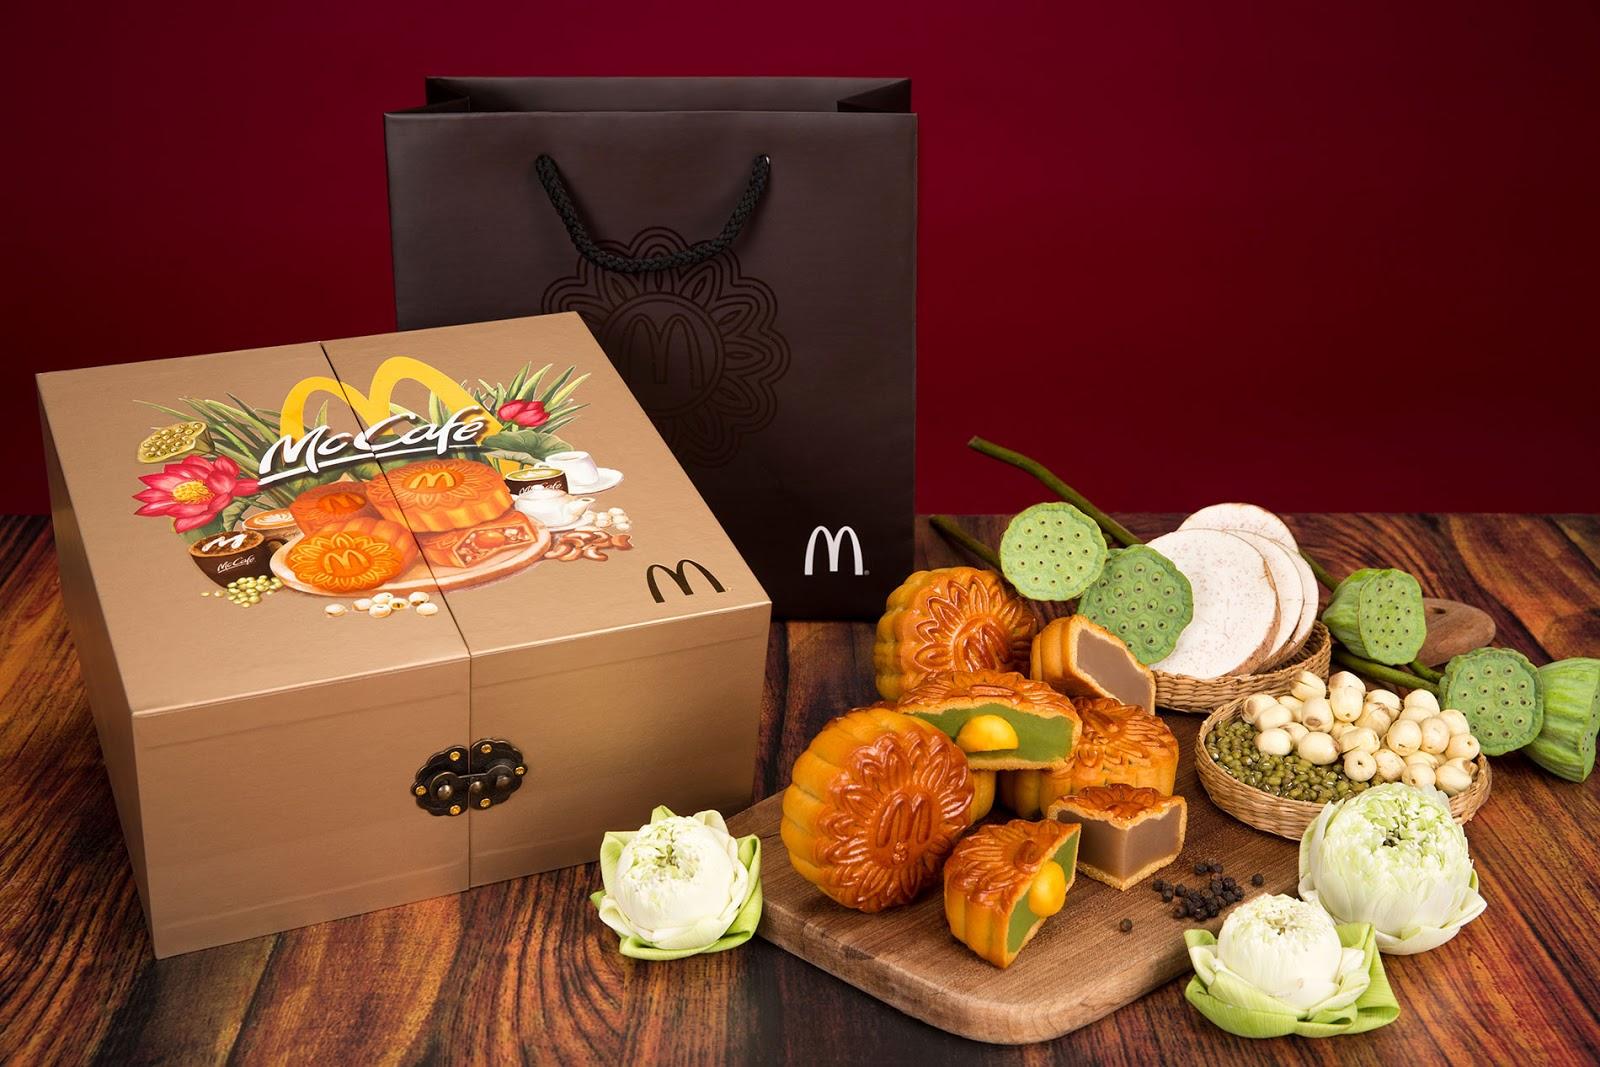 McDonald's Vietnam - Mooncake Box 2017 on Packaging of the